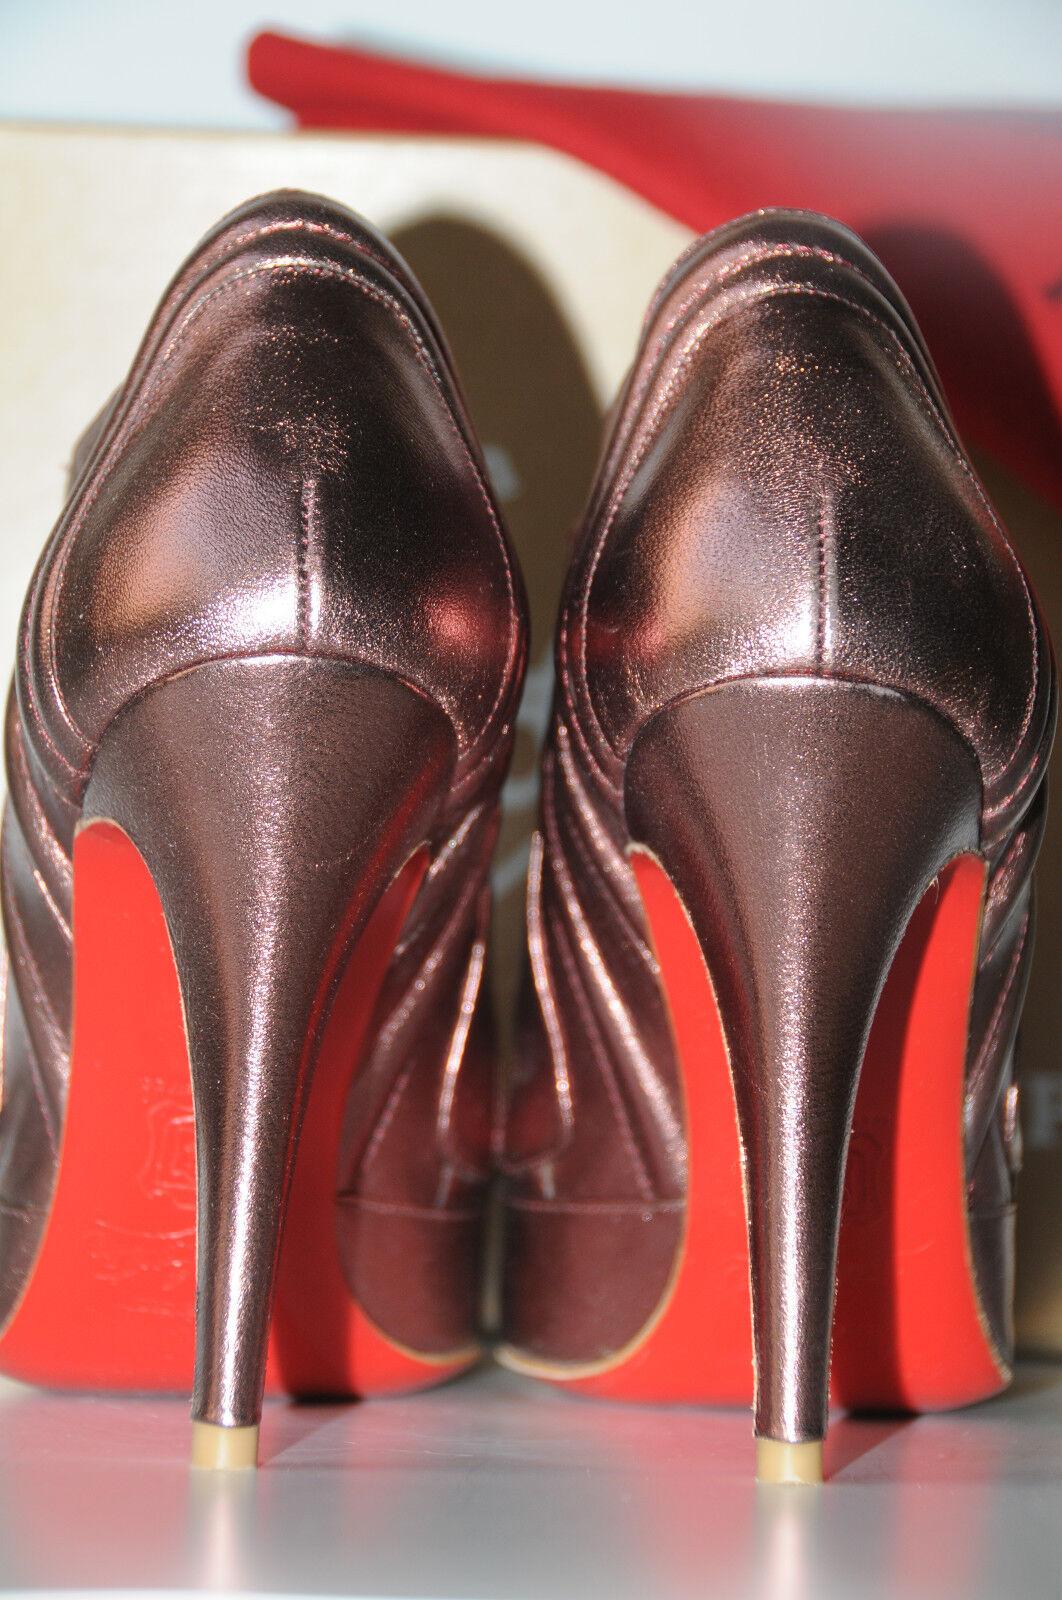 1125 New CHRISTIAN LOUBOUTIN LOUBOUTIN LOUBOUTIN SIGOURNEY Rosa MAUVE lila schuhe Stiefel 39 8.5 69f780